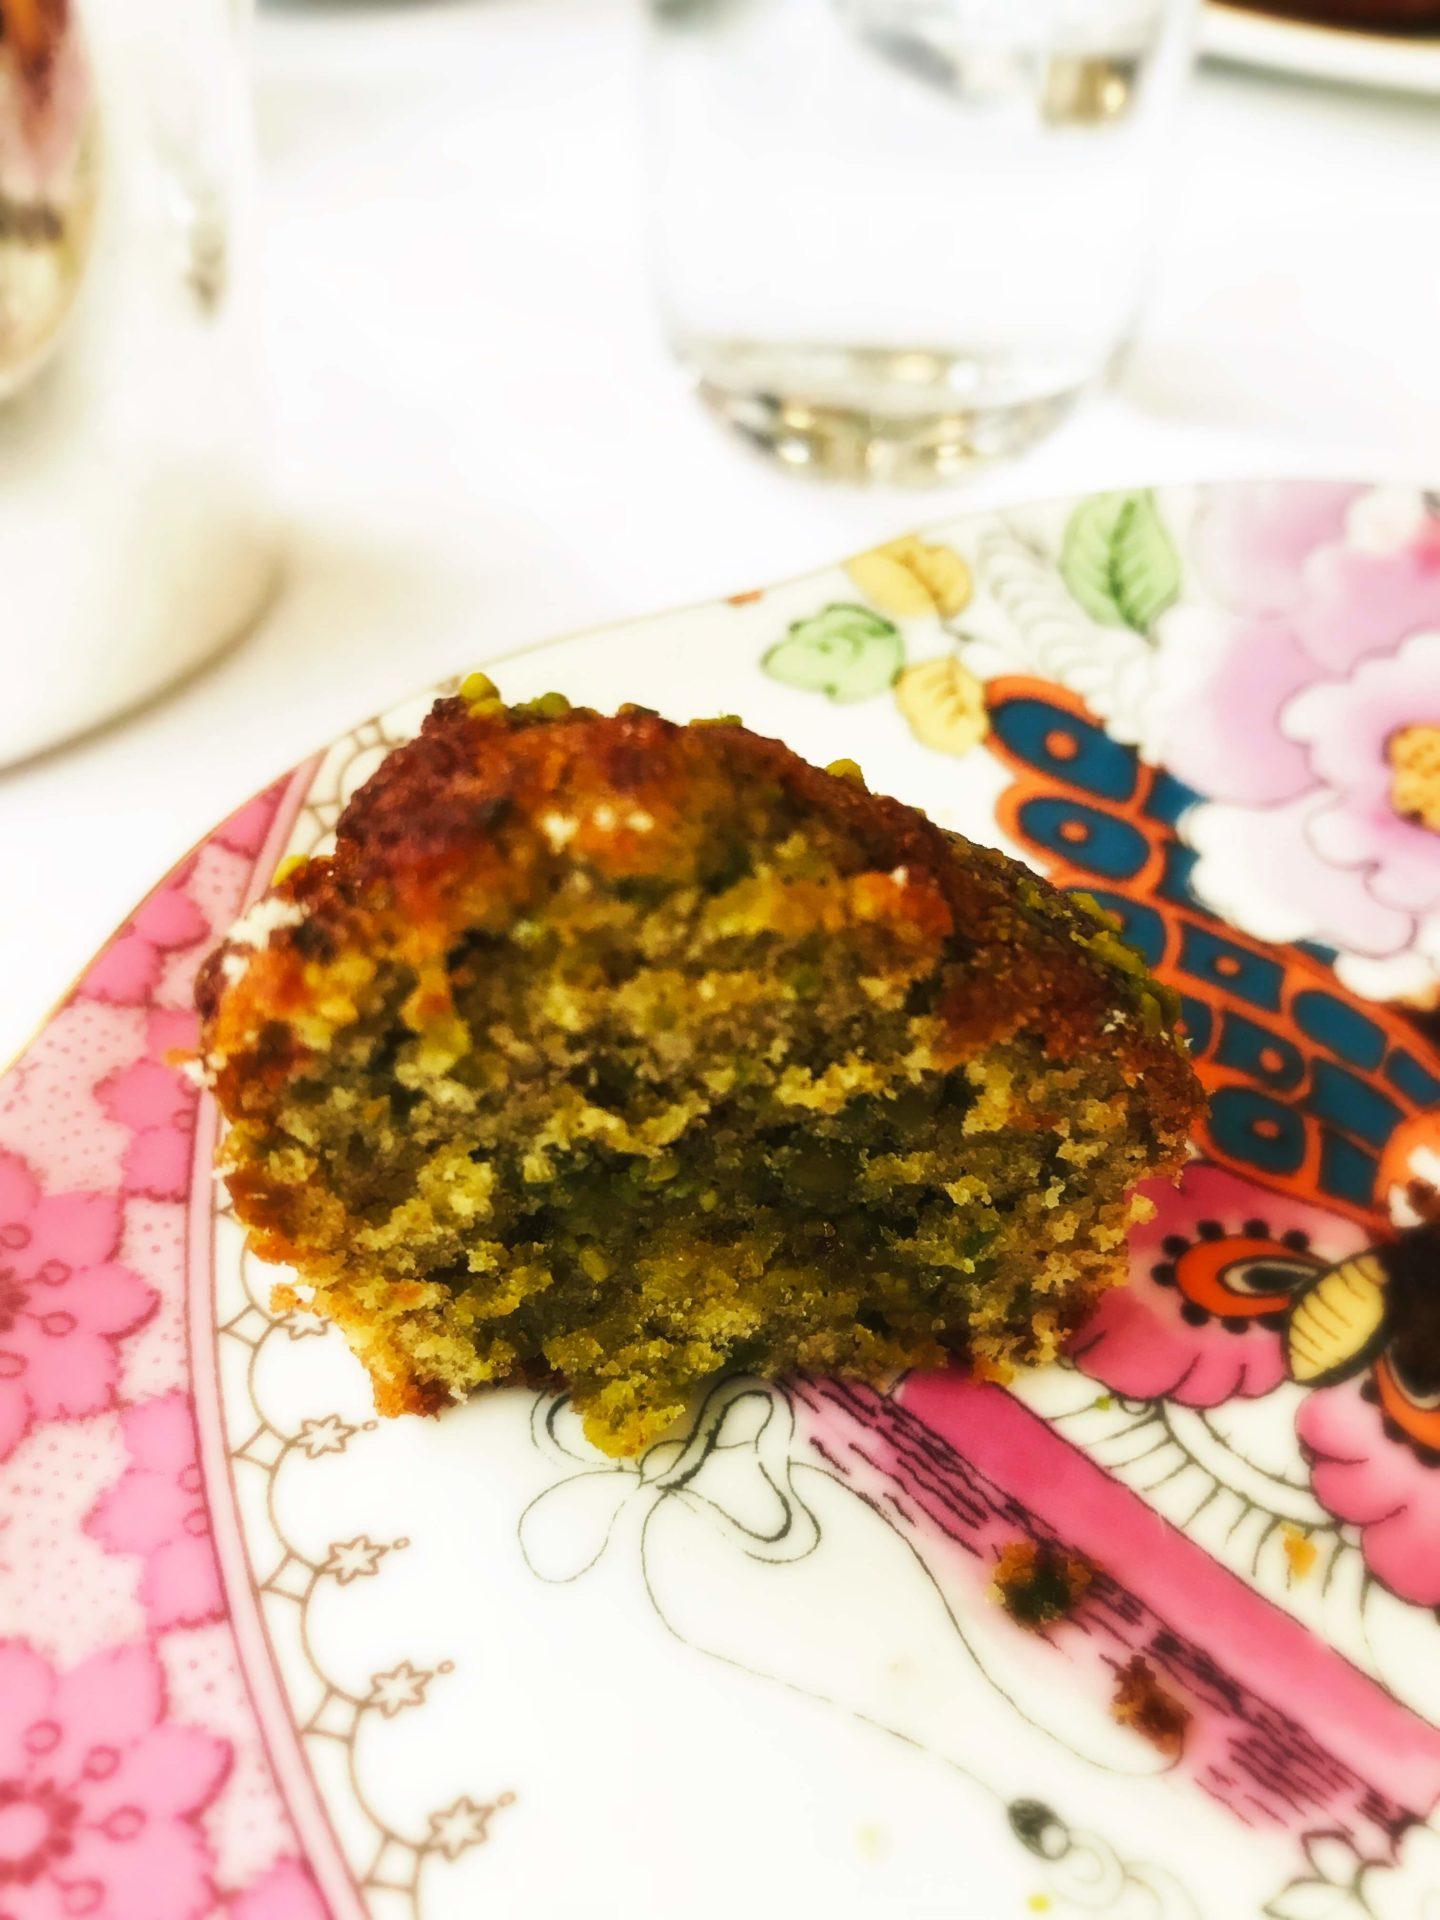 gâteau pistache Prince de Galles Nicolas Paciello